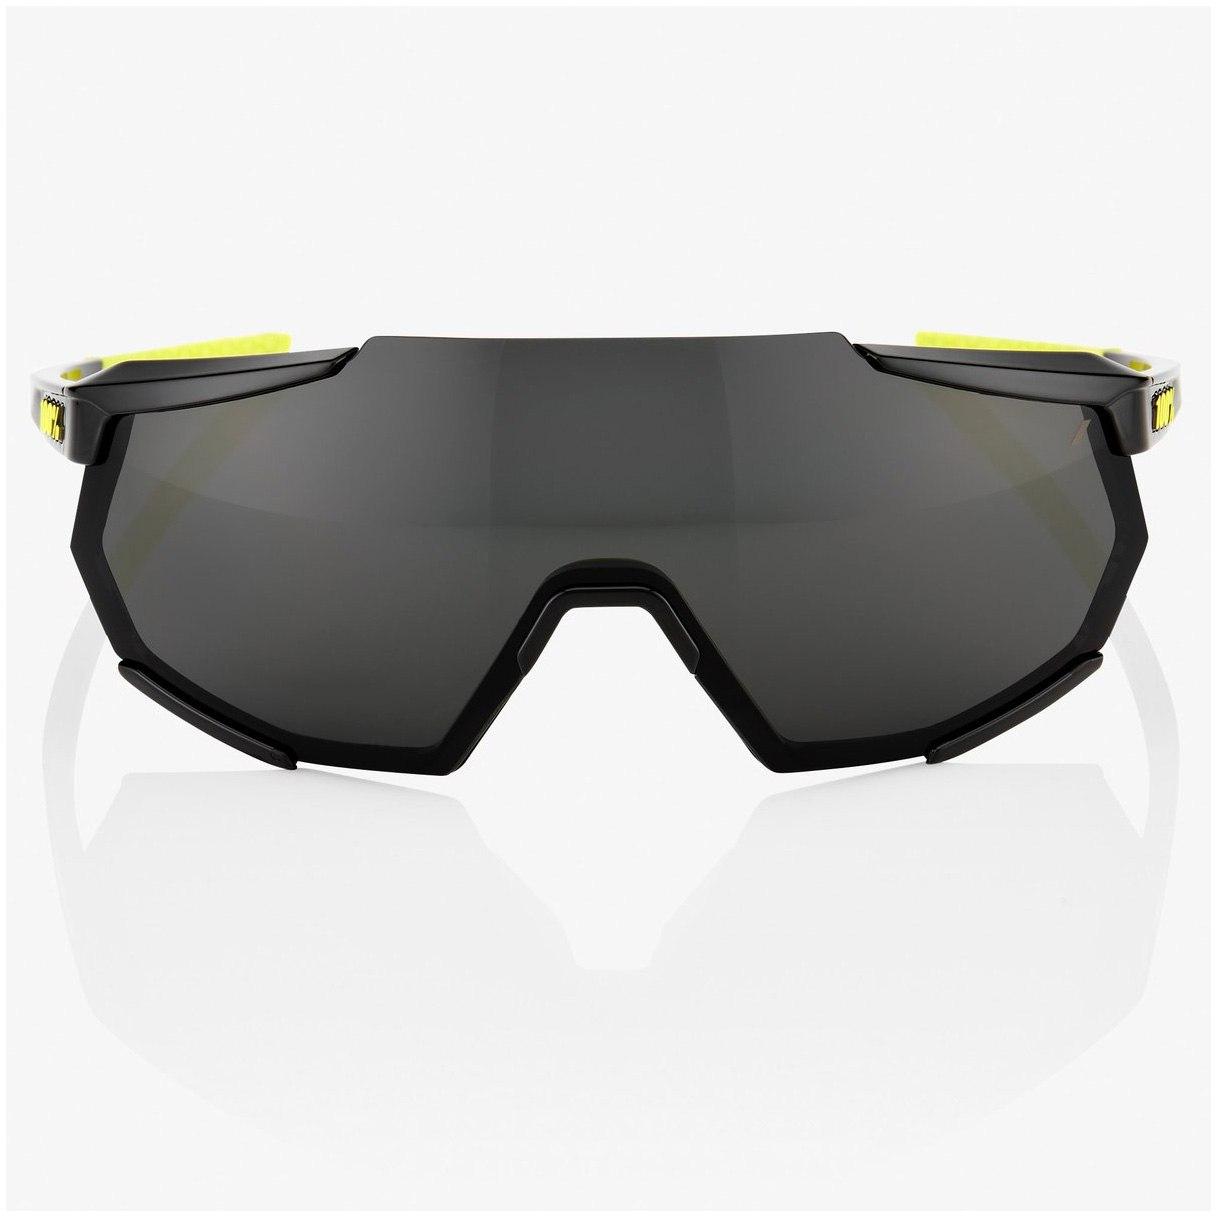 Imagen de 100% Racetrap Glasses - Gloss Black/Smoke + Clear